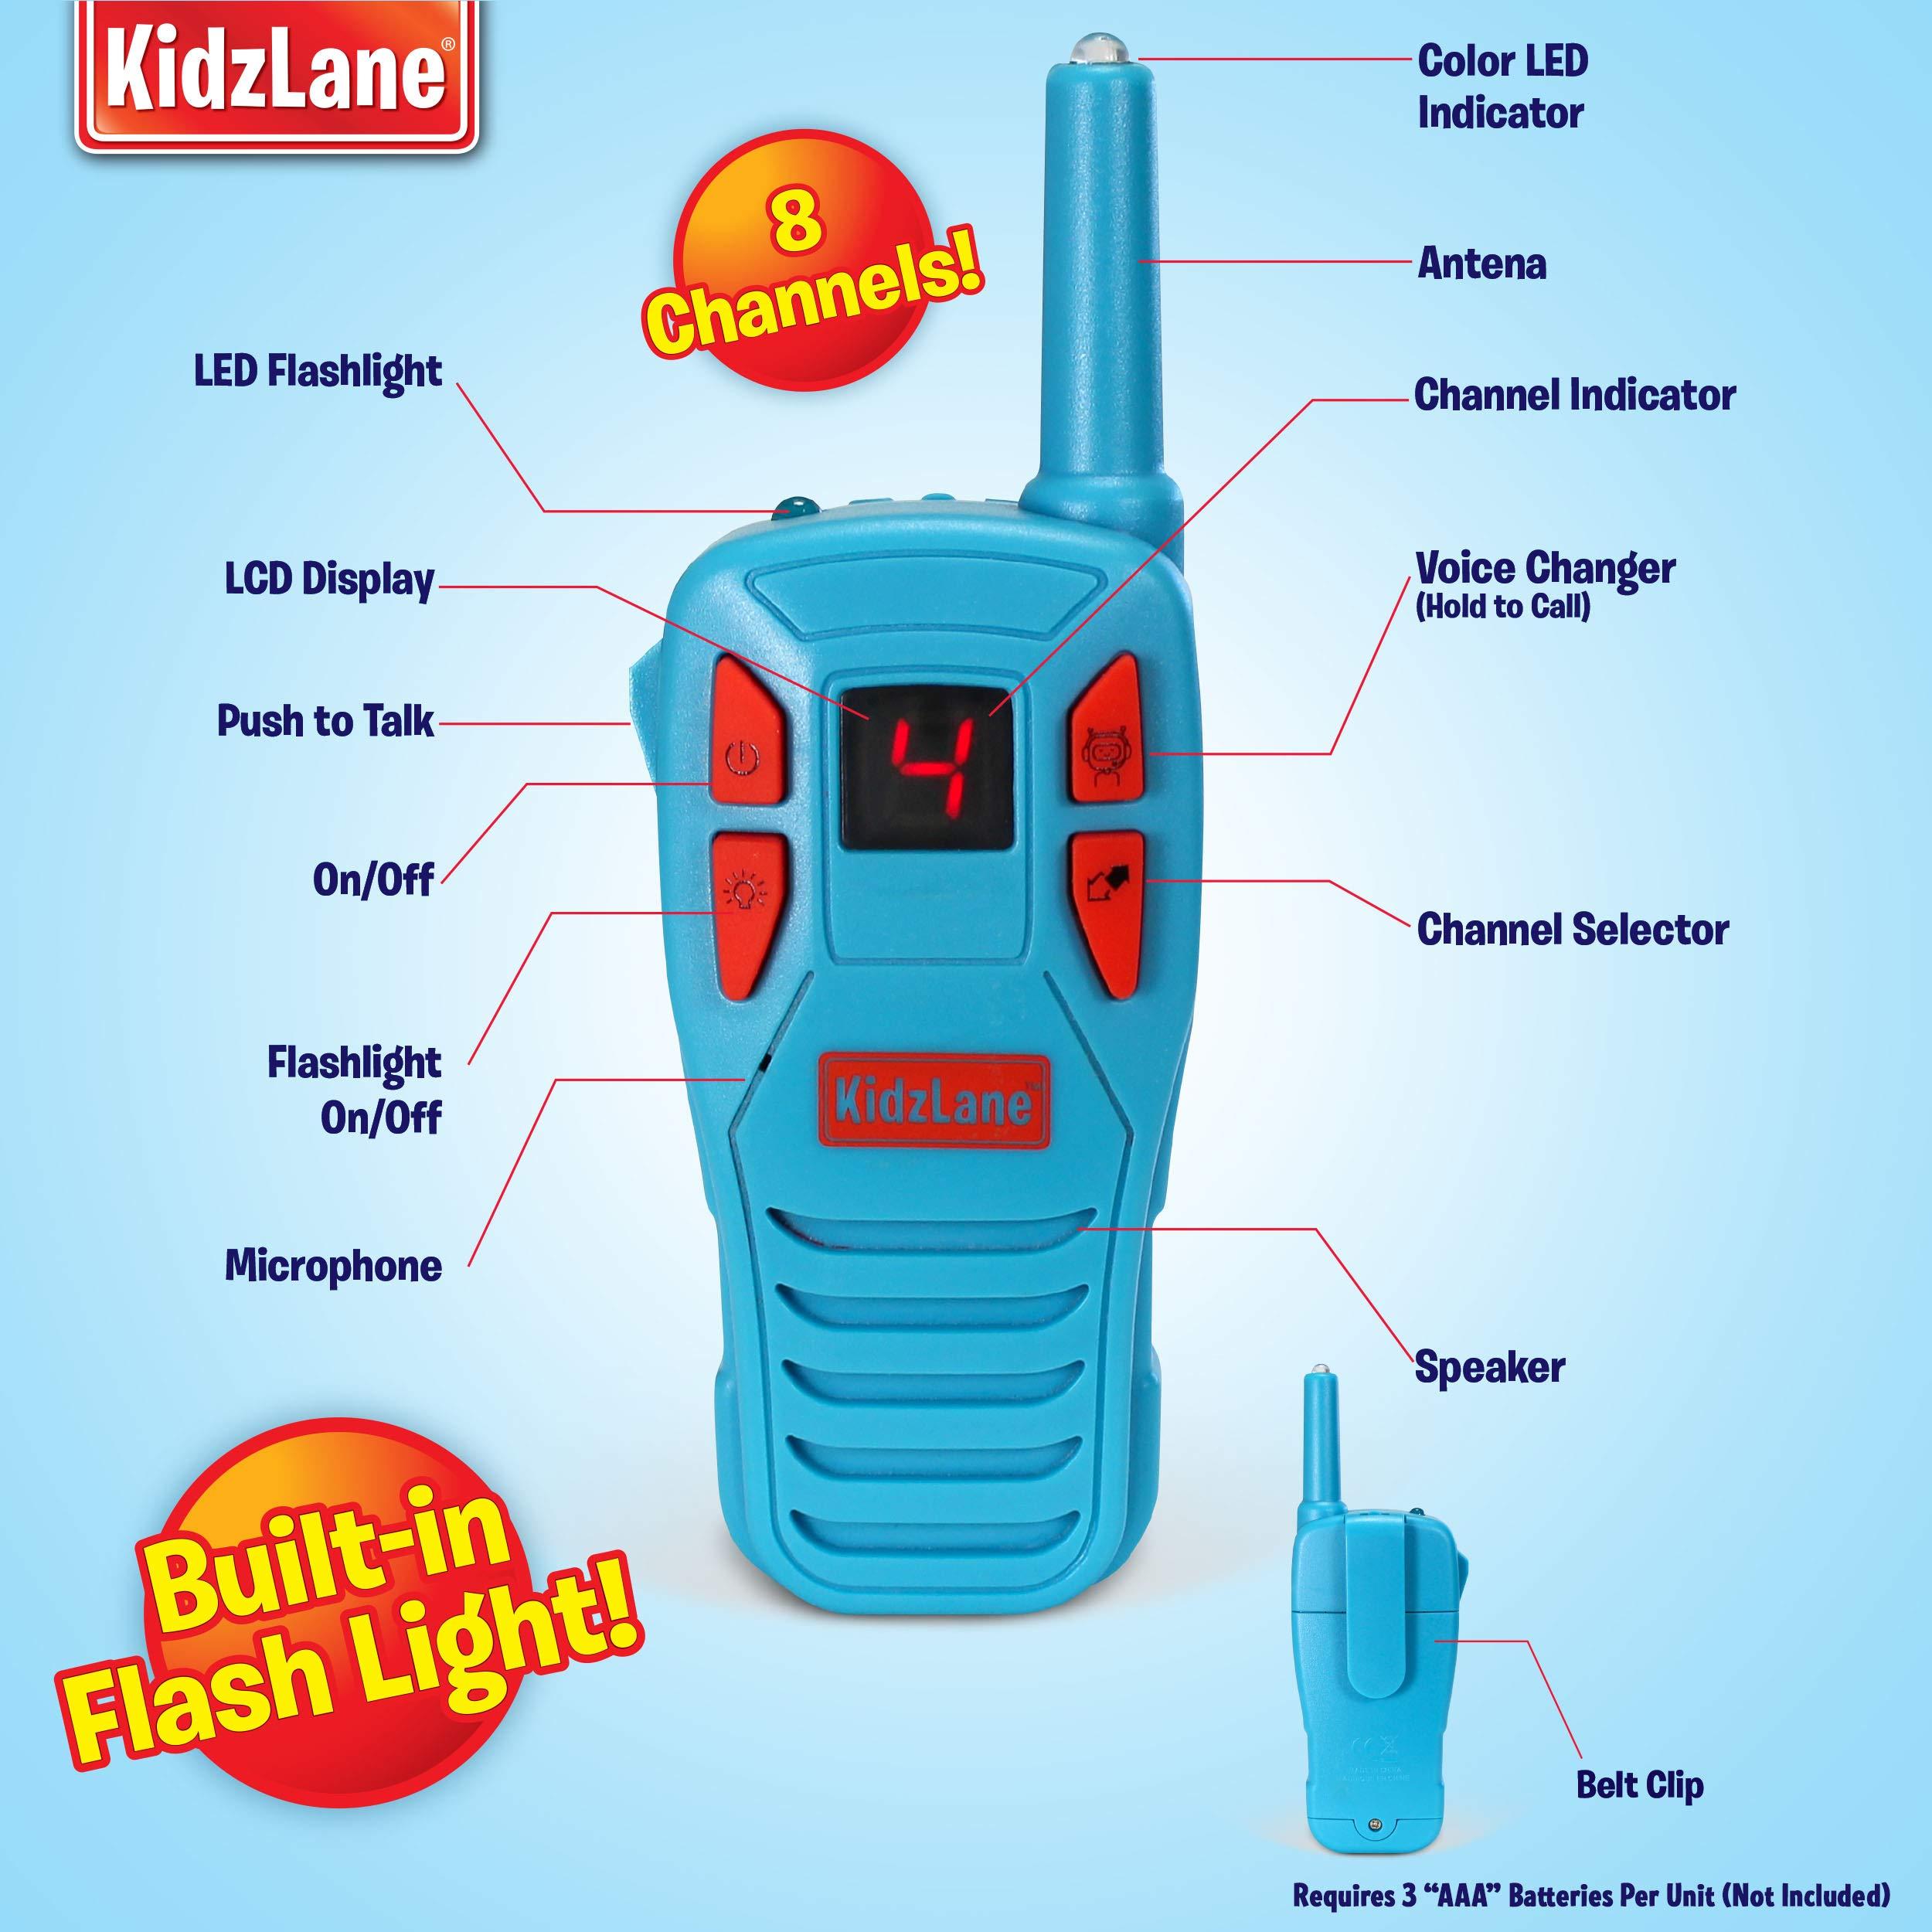 Kidzlane Voice Changing Walkie Talkies for Kids - 2 Mile Range, 8 Channels, Flashlight, & Call Alert by Kidzlane (Image #3)